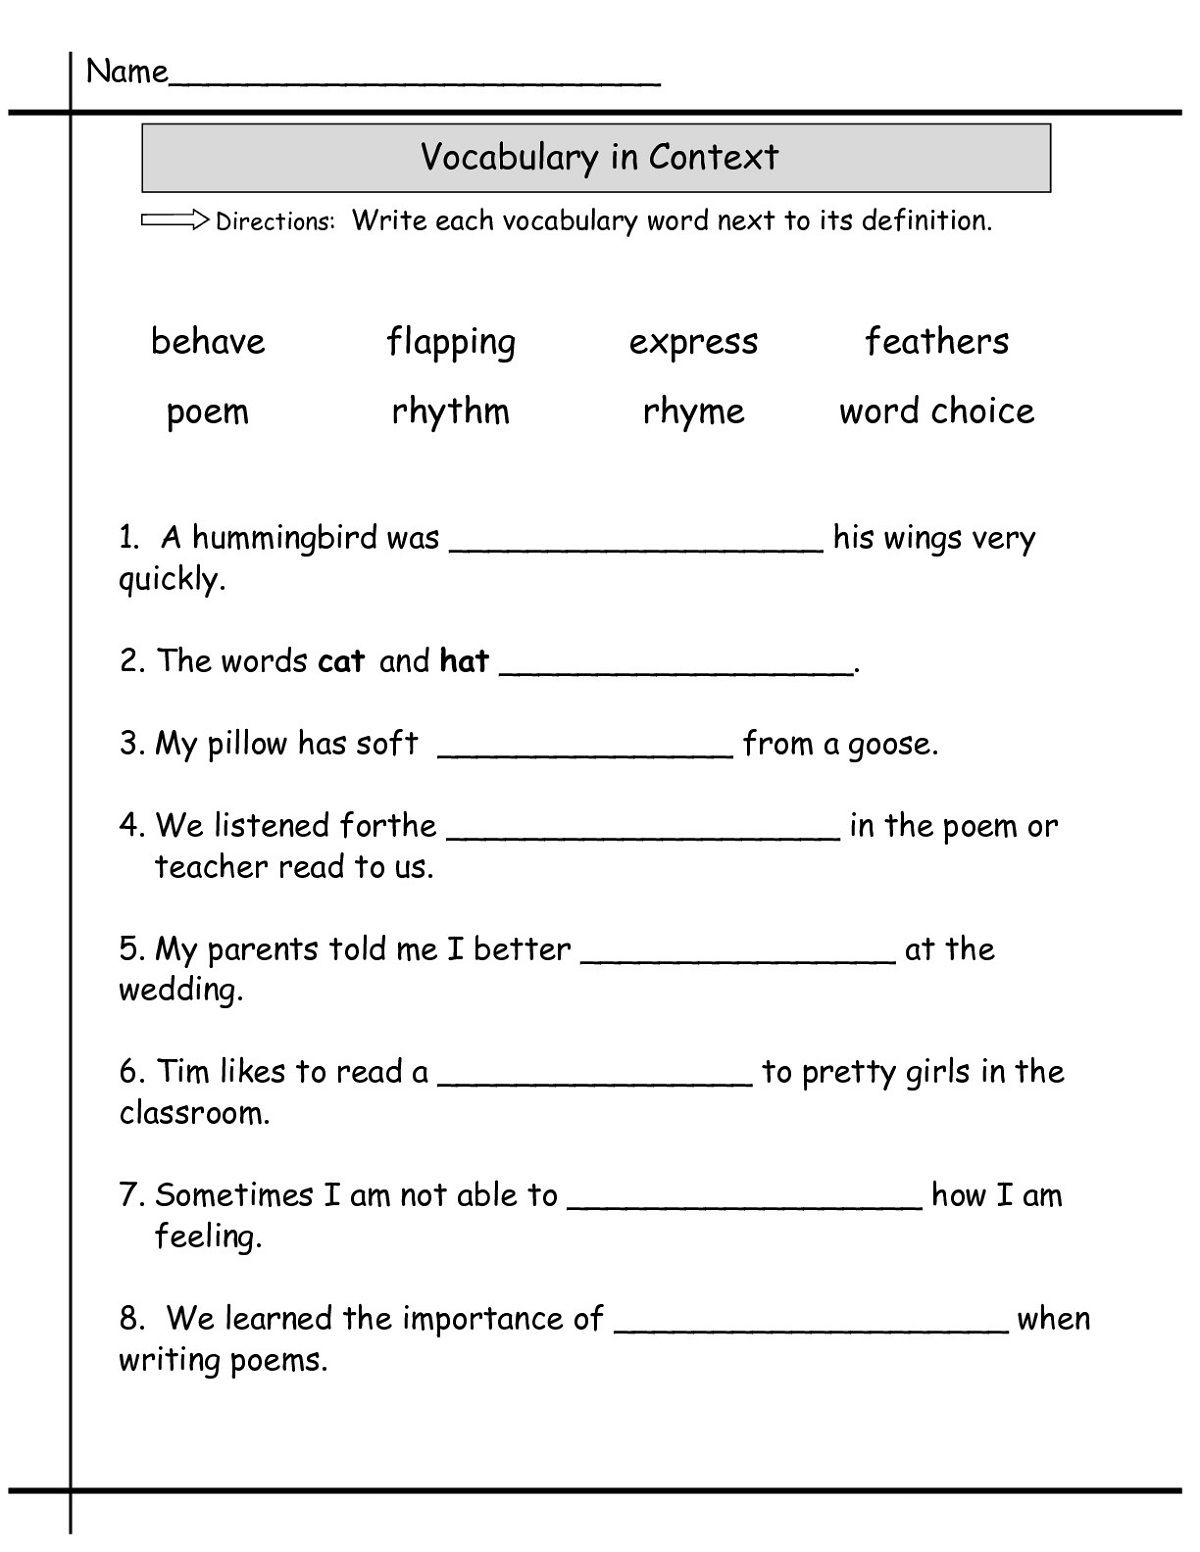 https://dubaikhalifas.com/free-english-grammar-worksheet-for-class-2-finest-worksheet/ [ 91 x 1552 Pixel ]